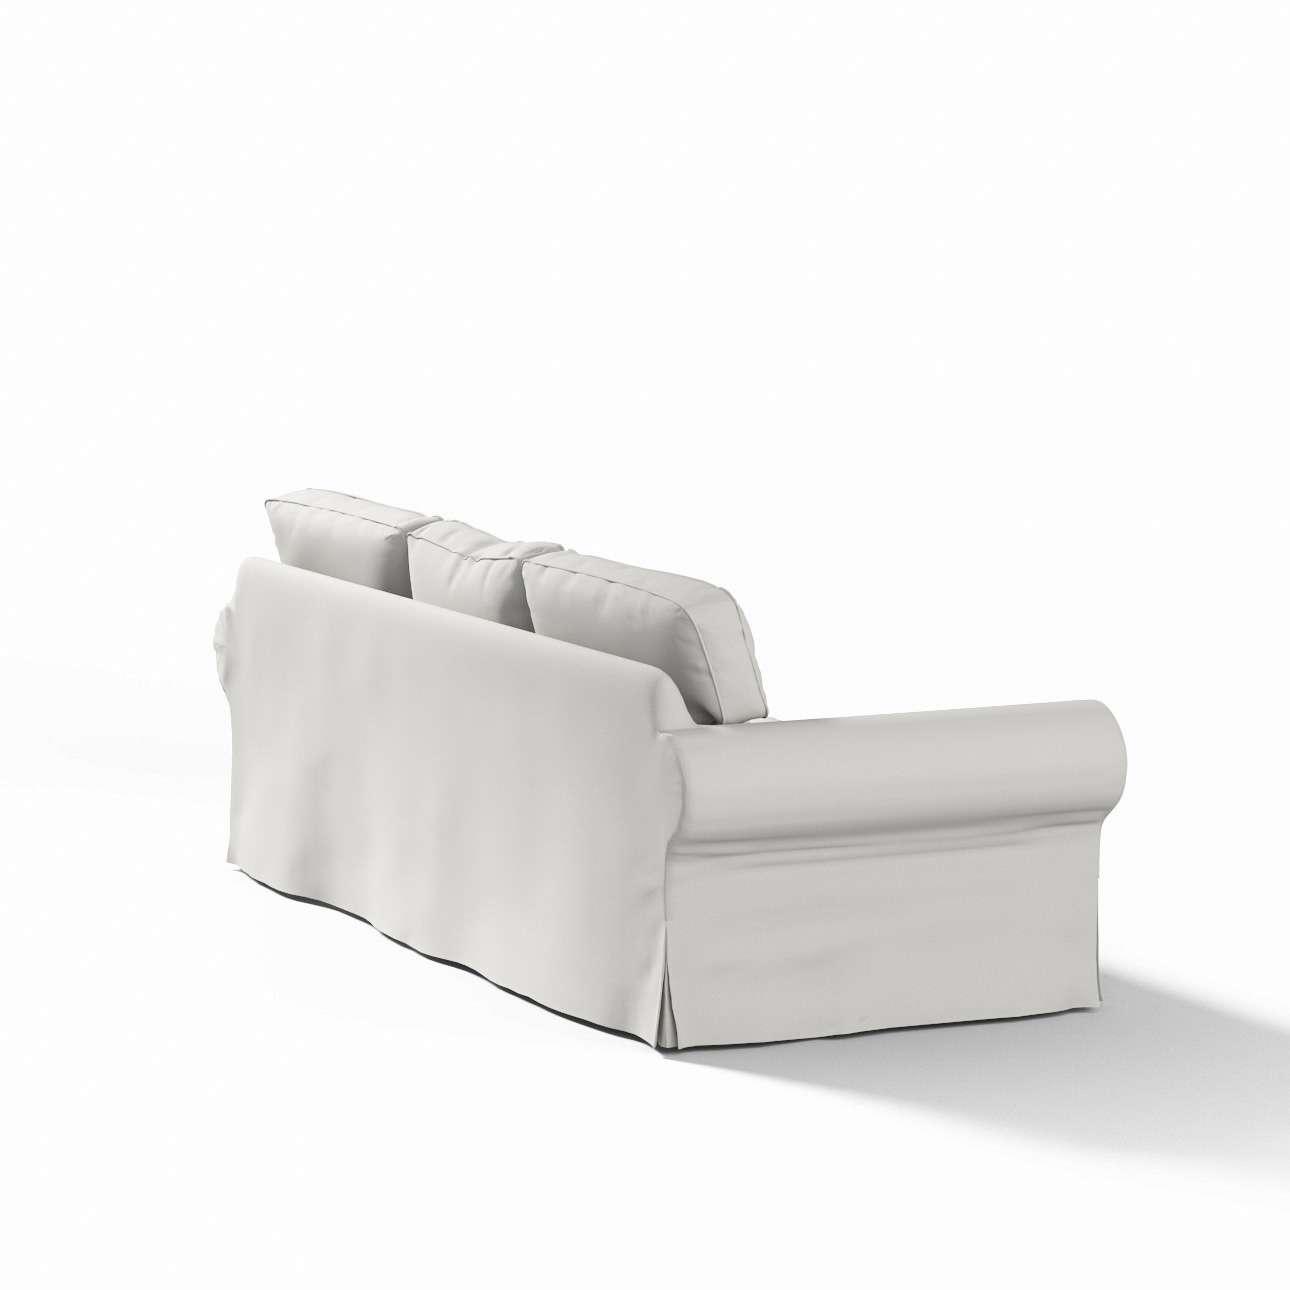 ektorp etna hellgrau beddinge bezug f r die halbe nackenrolle. Black Bedroom Furniture Sets. Home Design Ideas